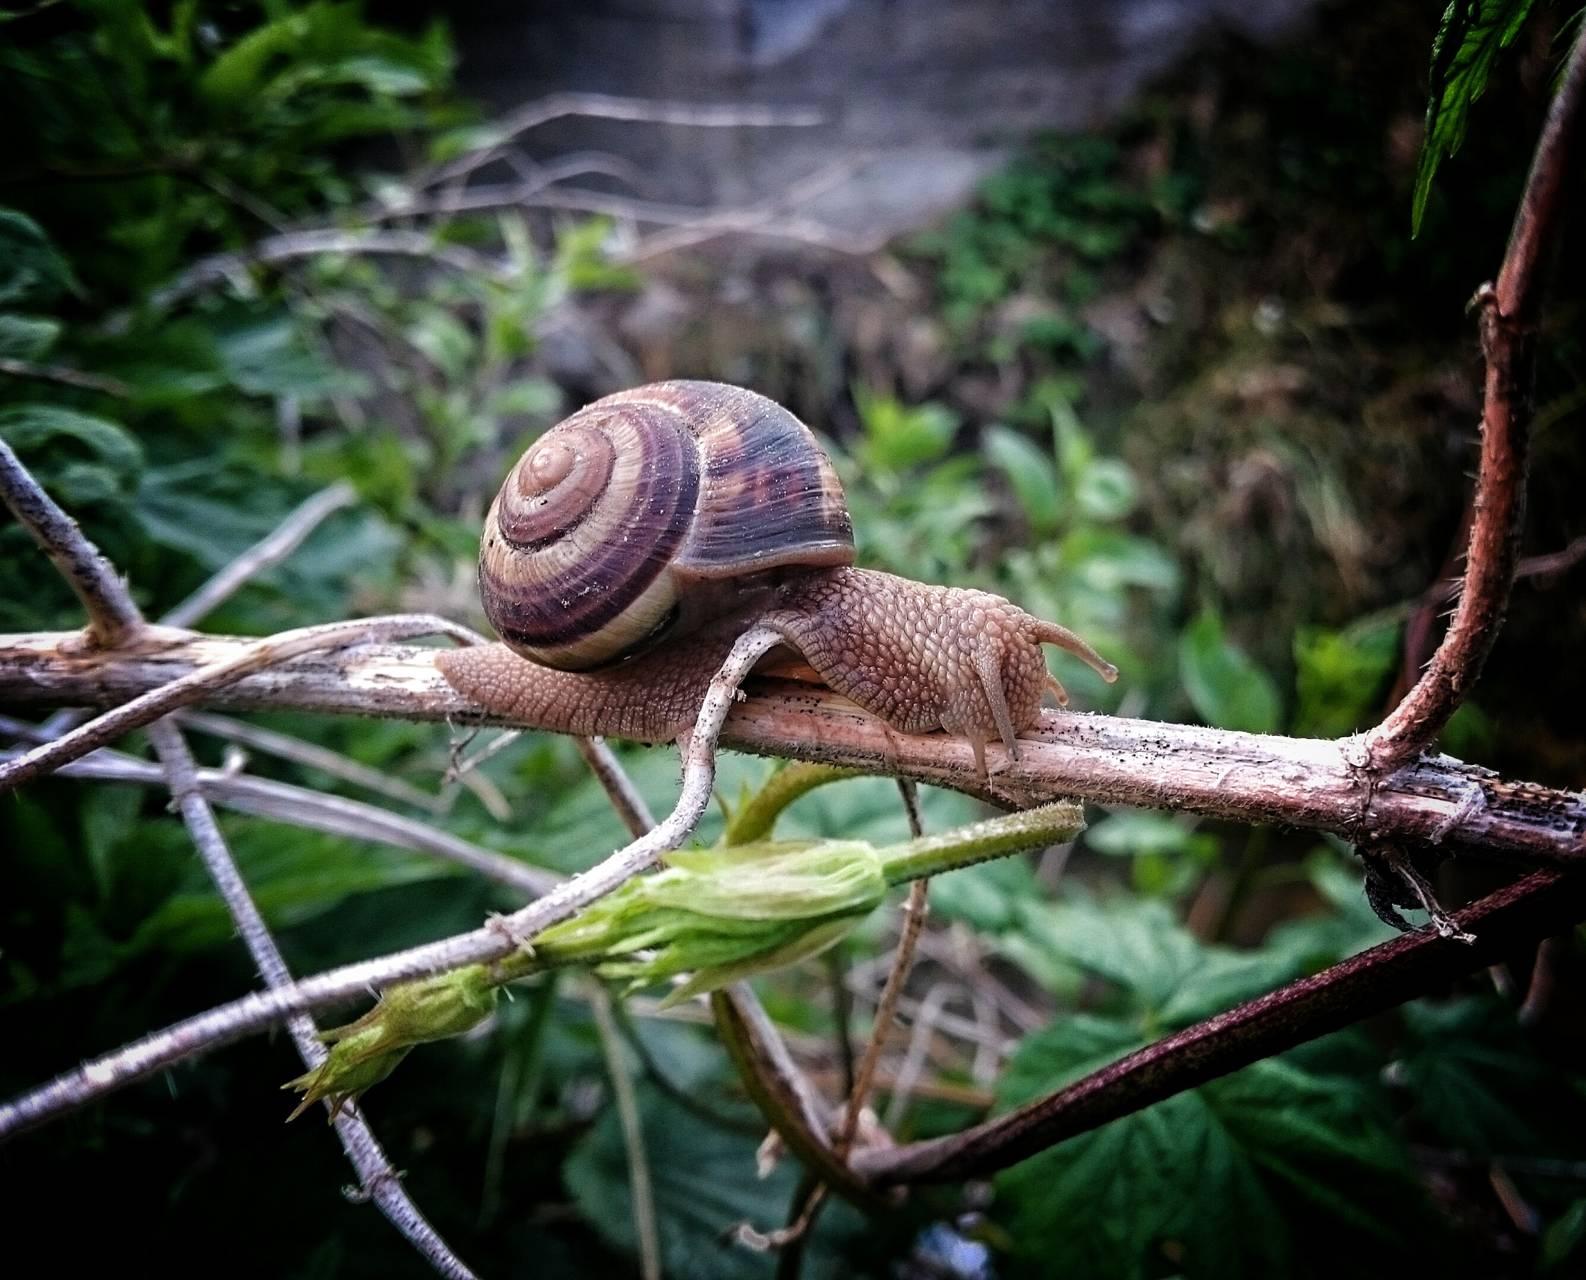 Snail on a twig